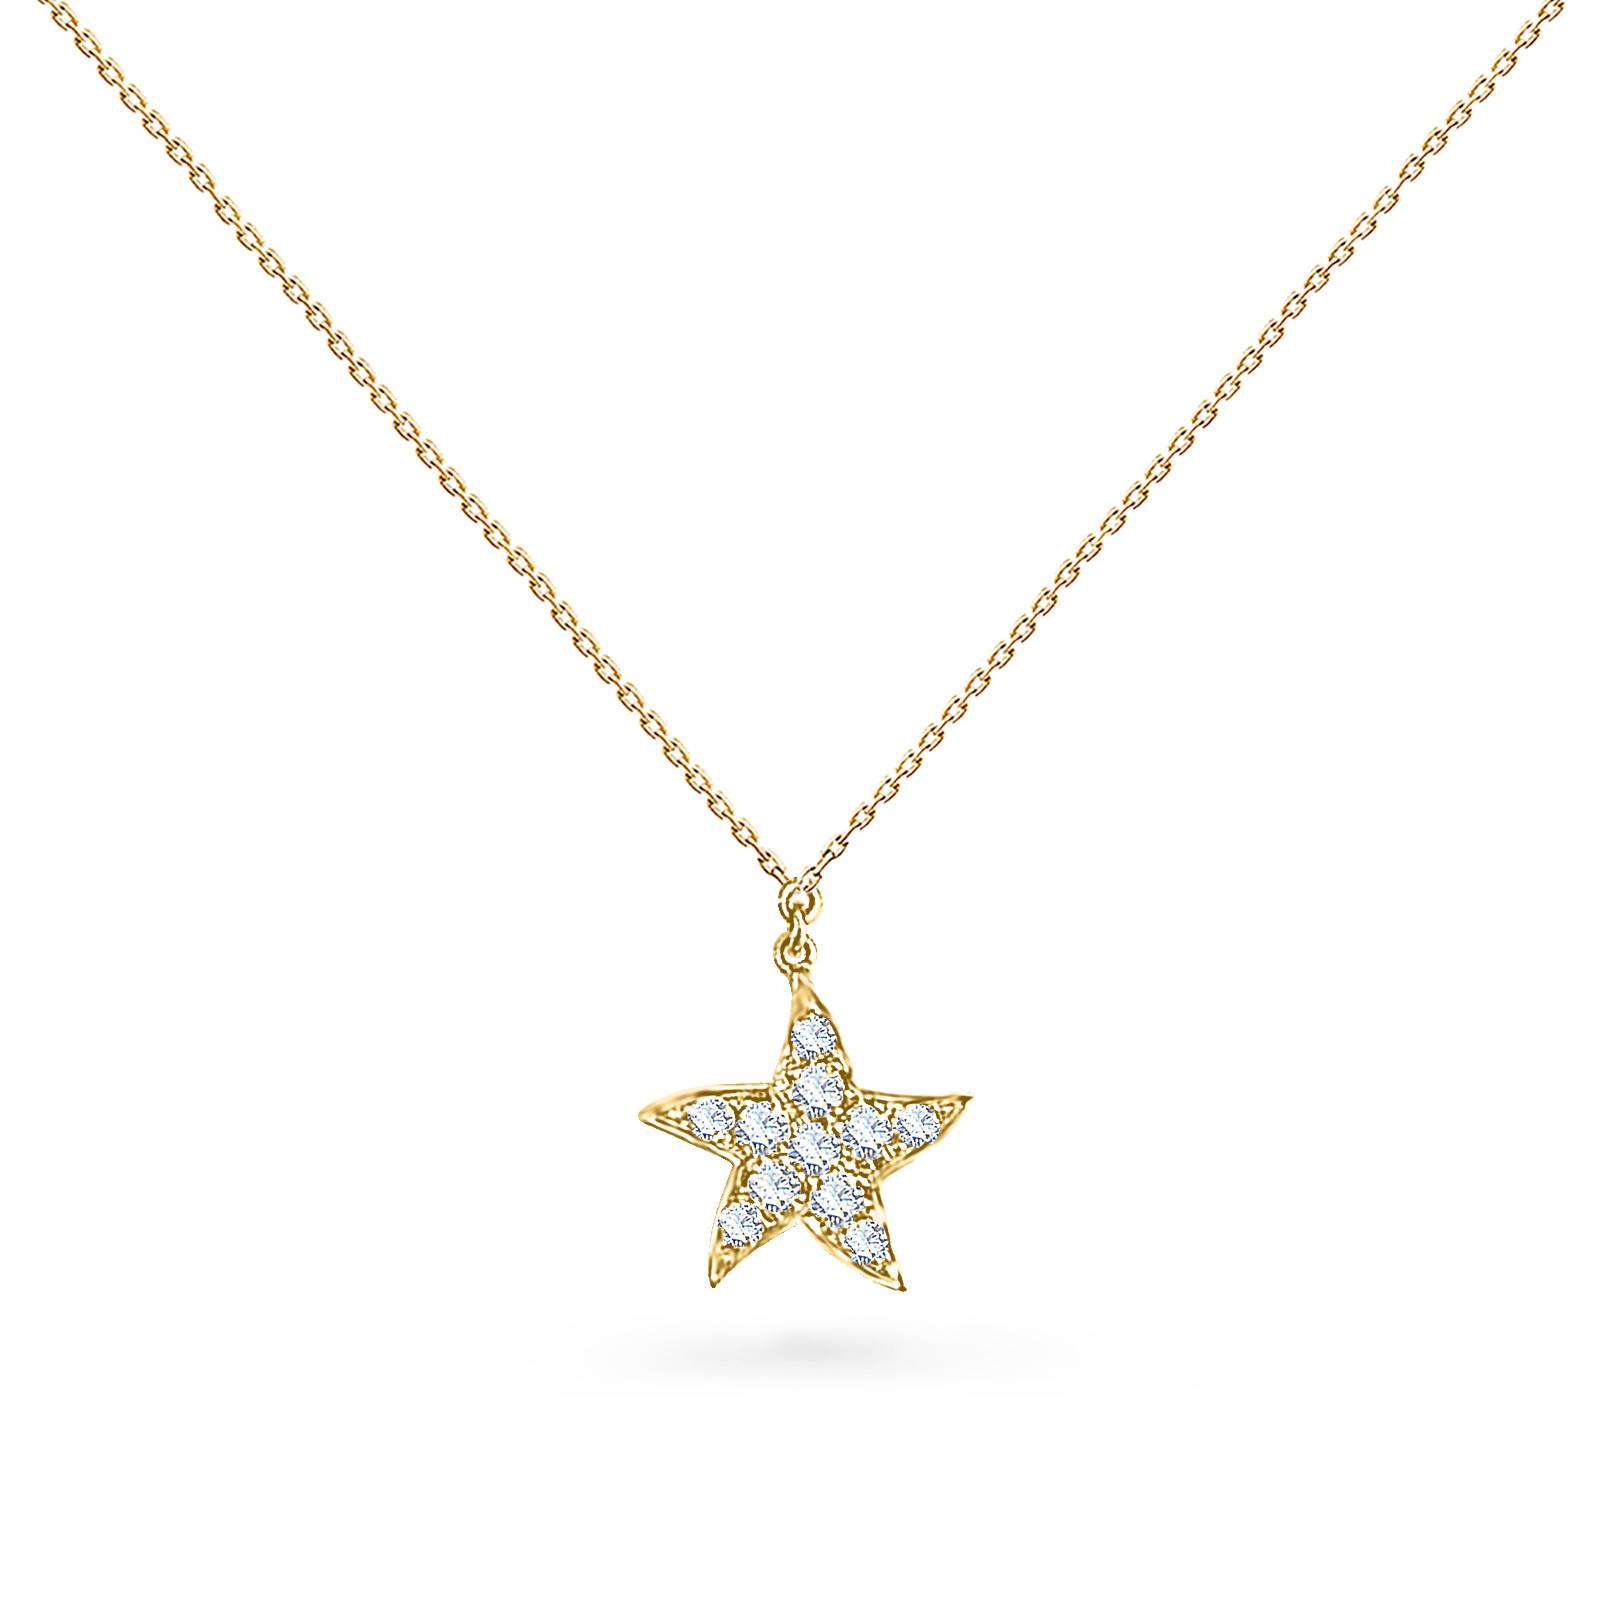 N-CAREEM-STARFISH-Y